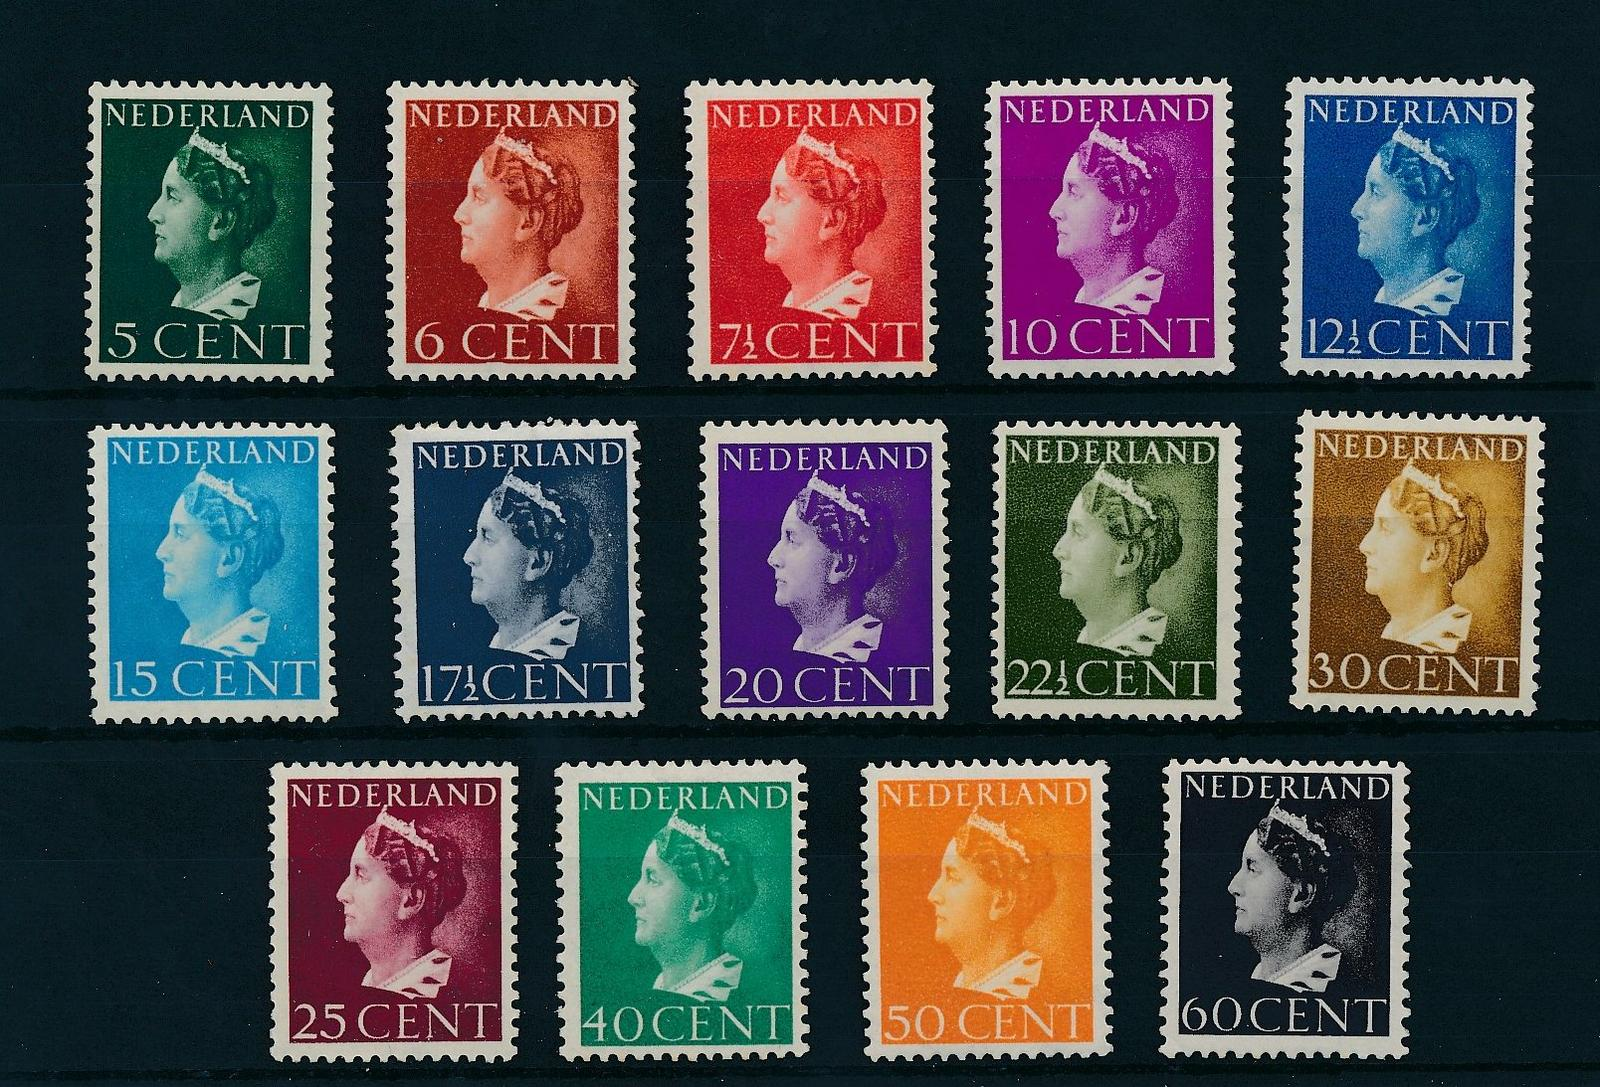 Nederland 1940-47 Frankeerzegels Koningin Wilhelmina 'Konijnenburg' 14 ' lage waarden NVPH 332-45